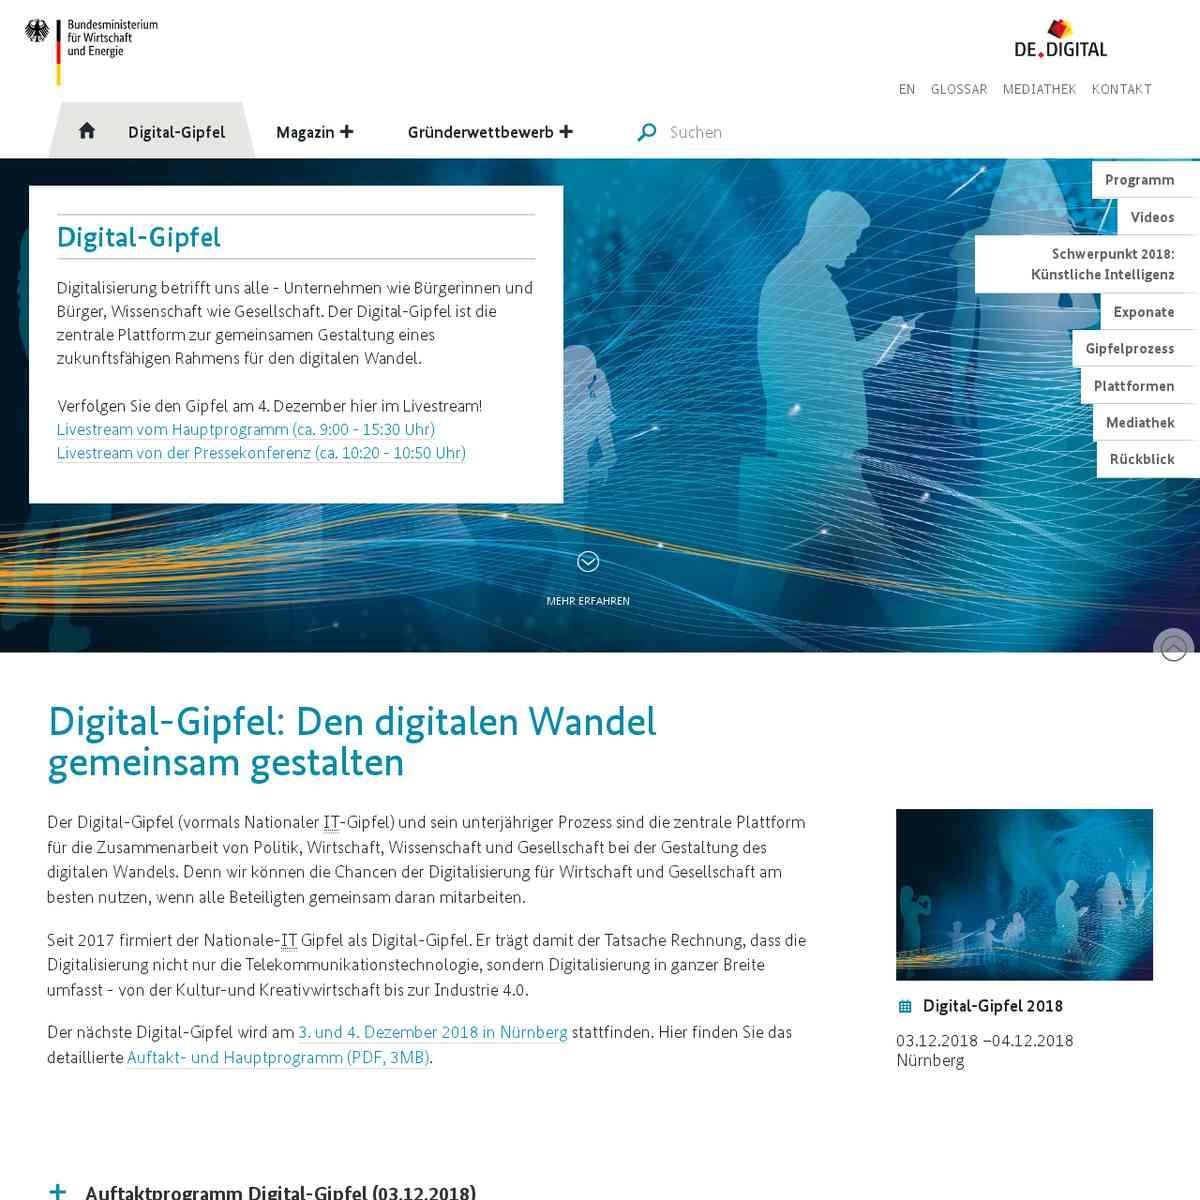 DE.DIGITAL - Digital-Gipfel